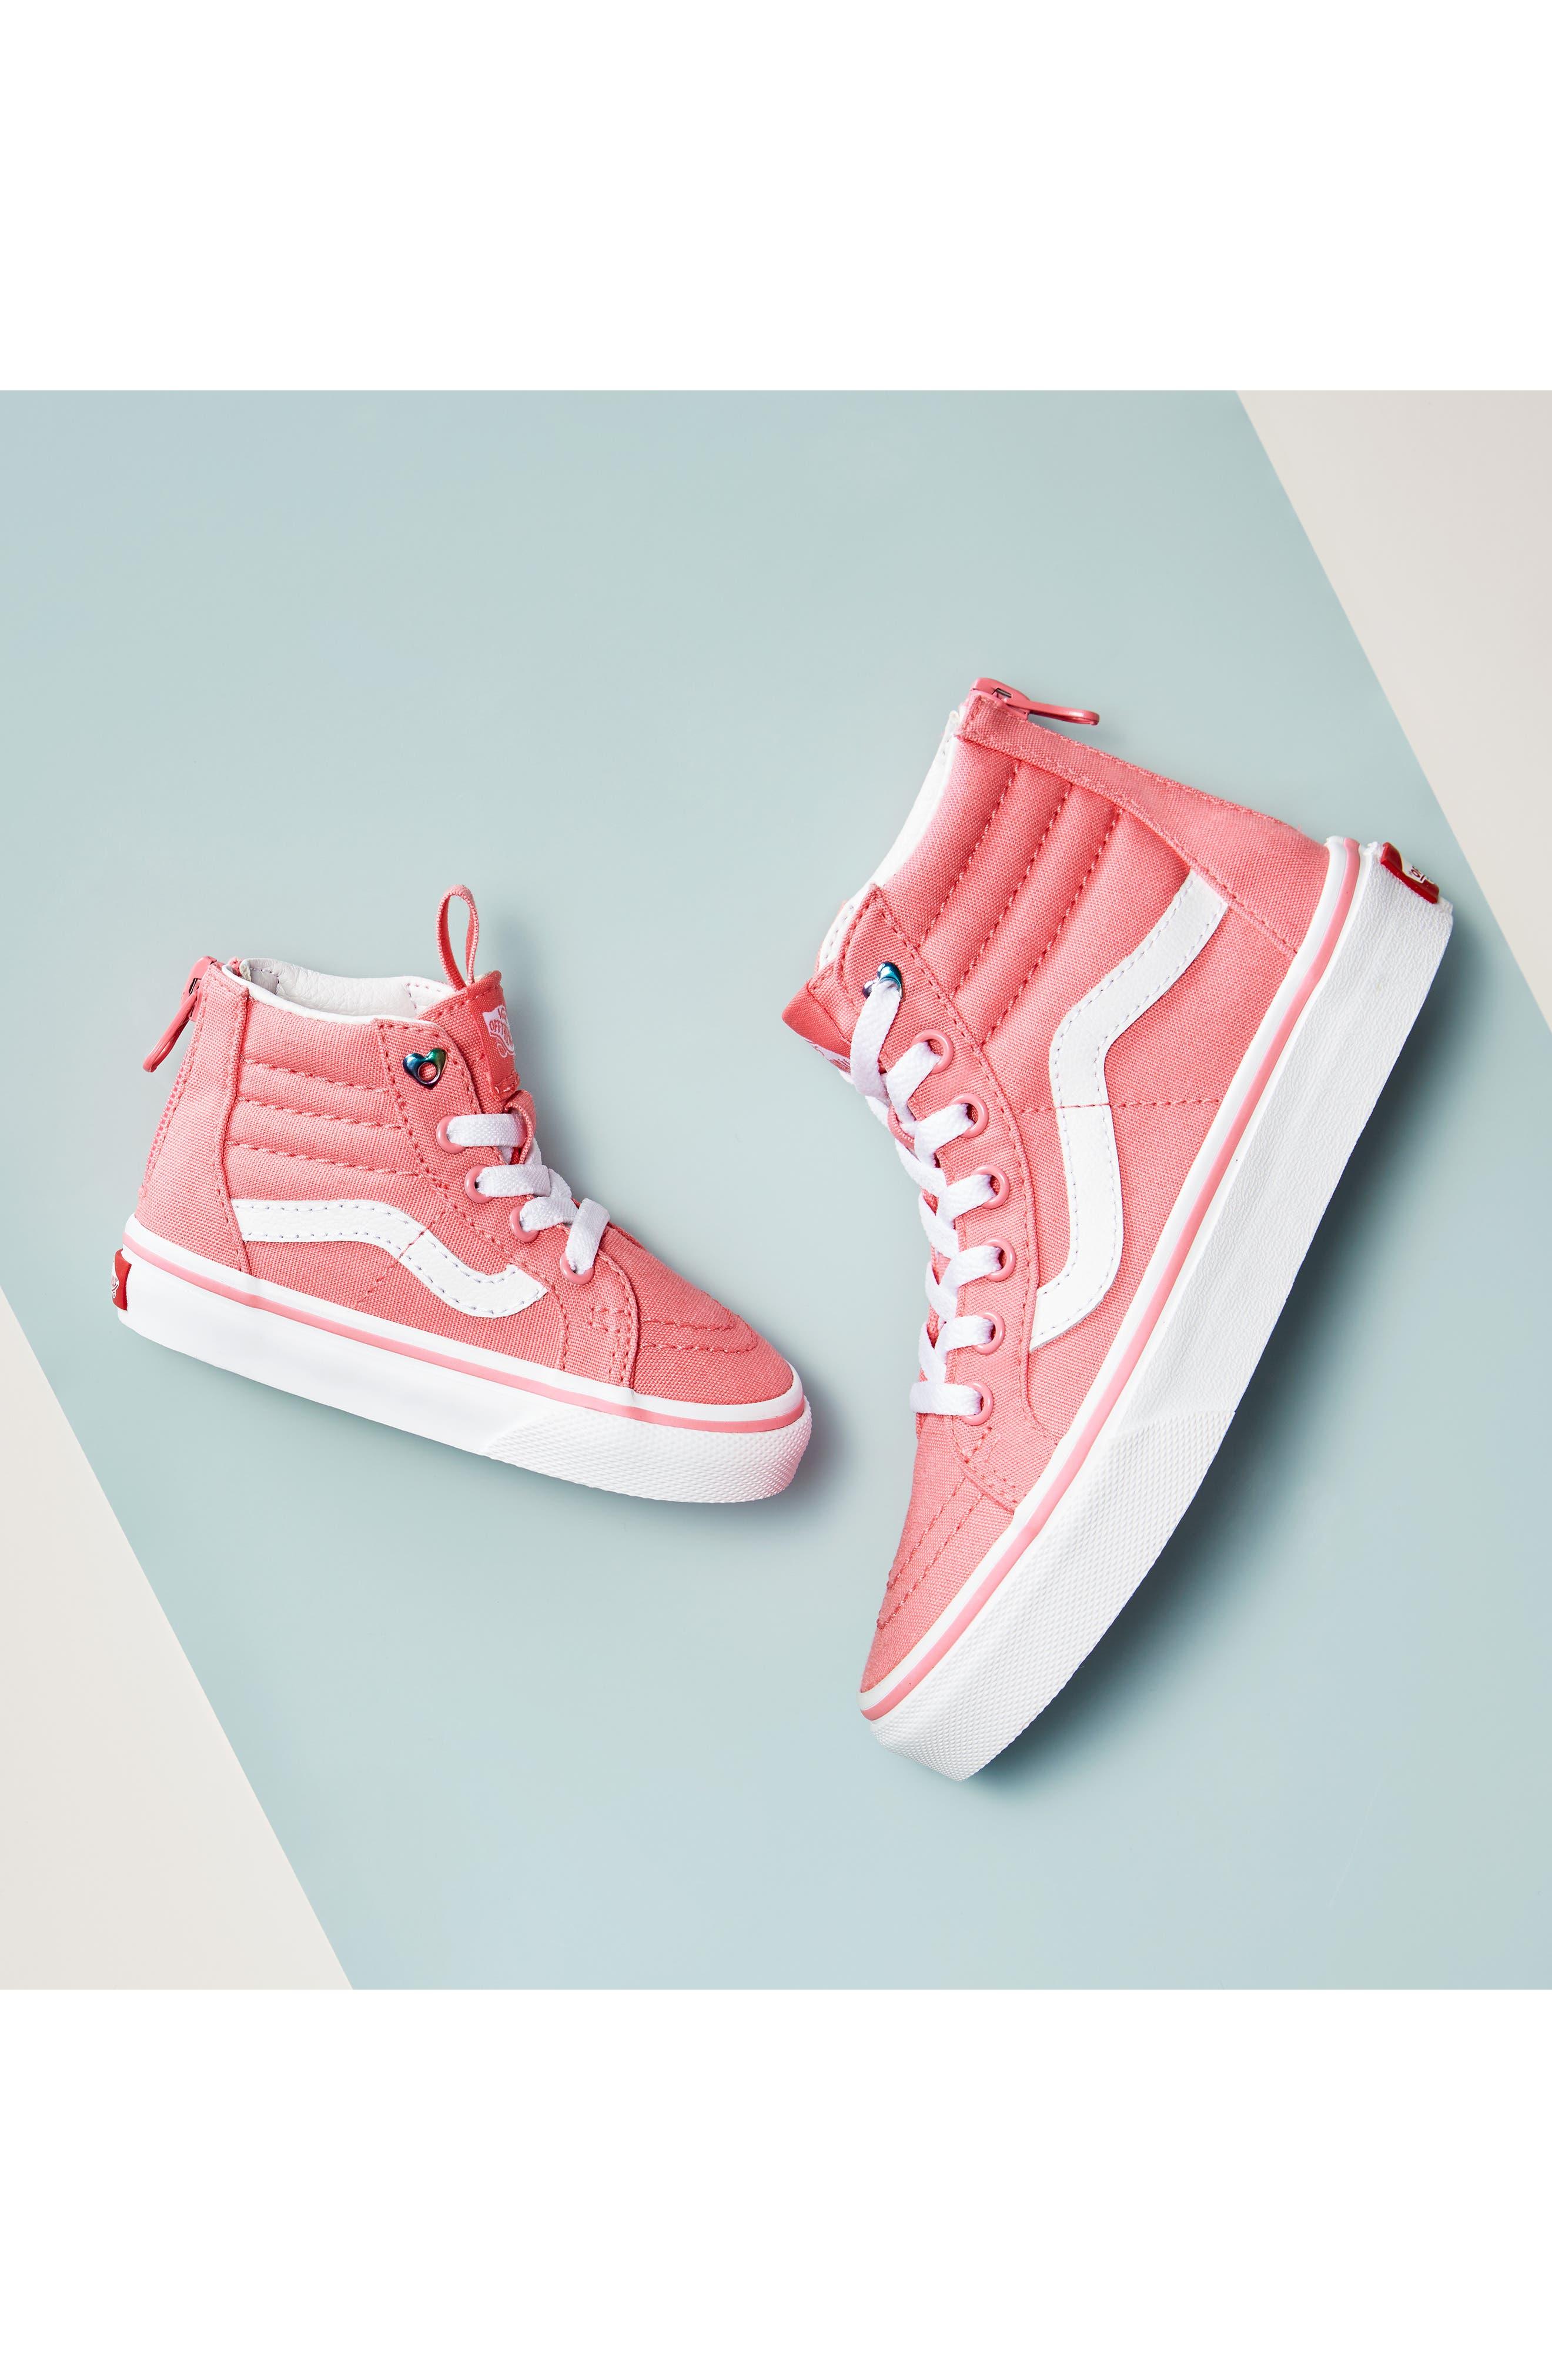 VANS, 'Sk8-Hi' Sneaker, Alternate thumbnail 7, color, INDIGO BUNTING/ TRUE WHITE